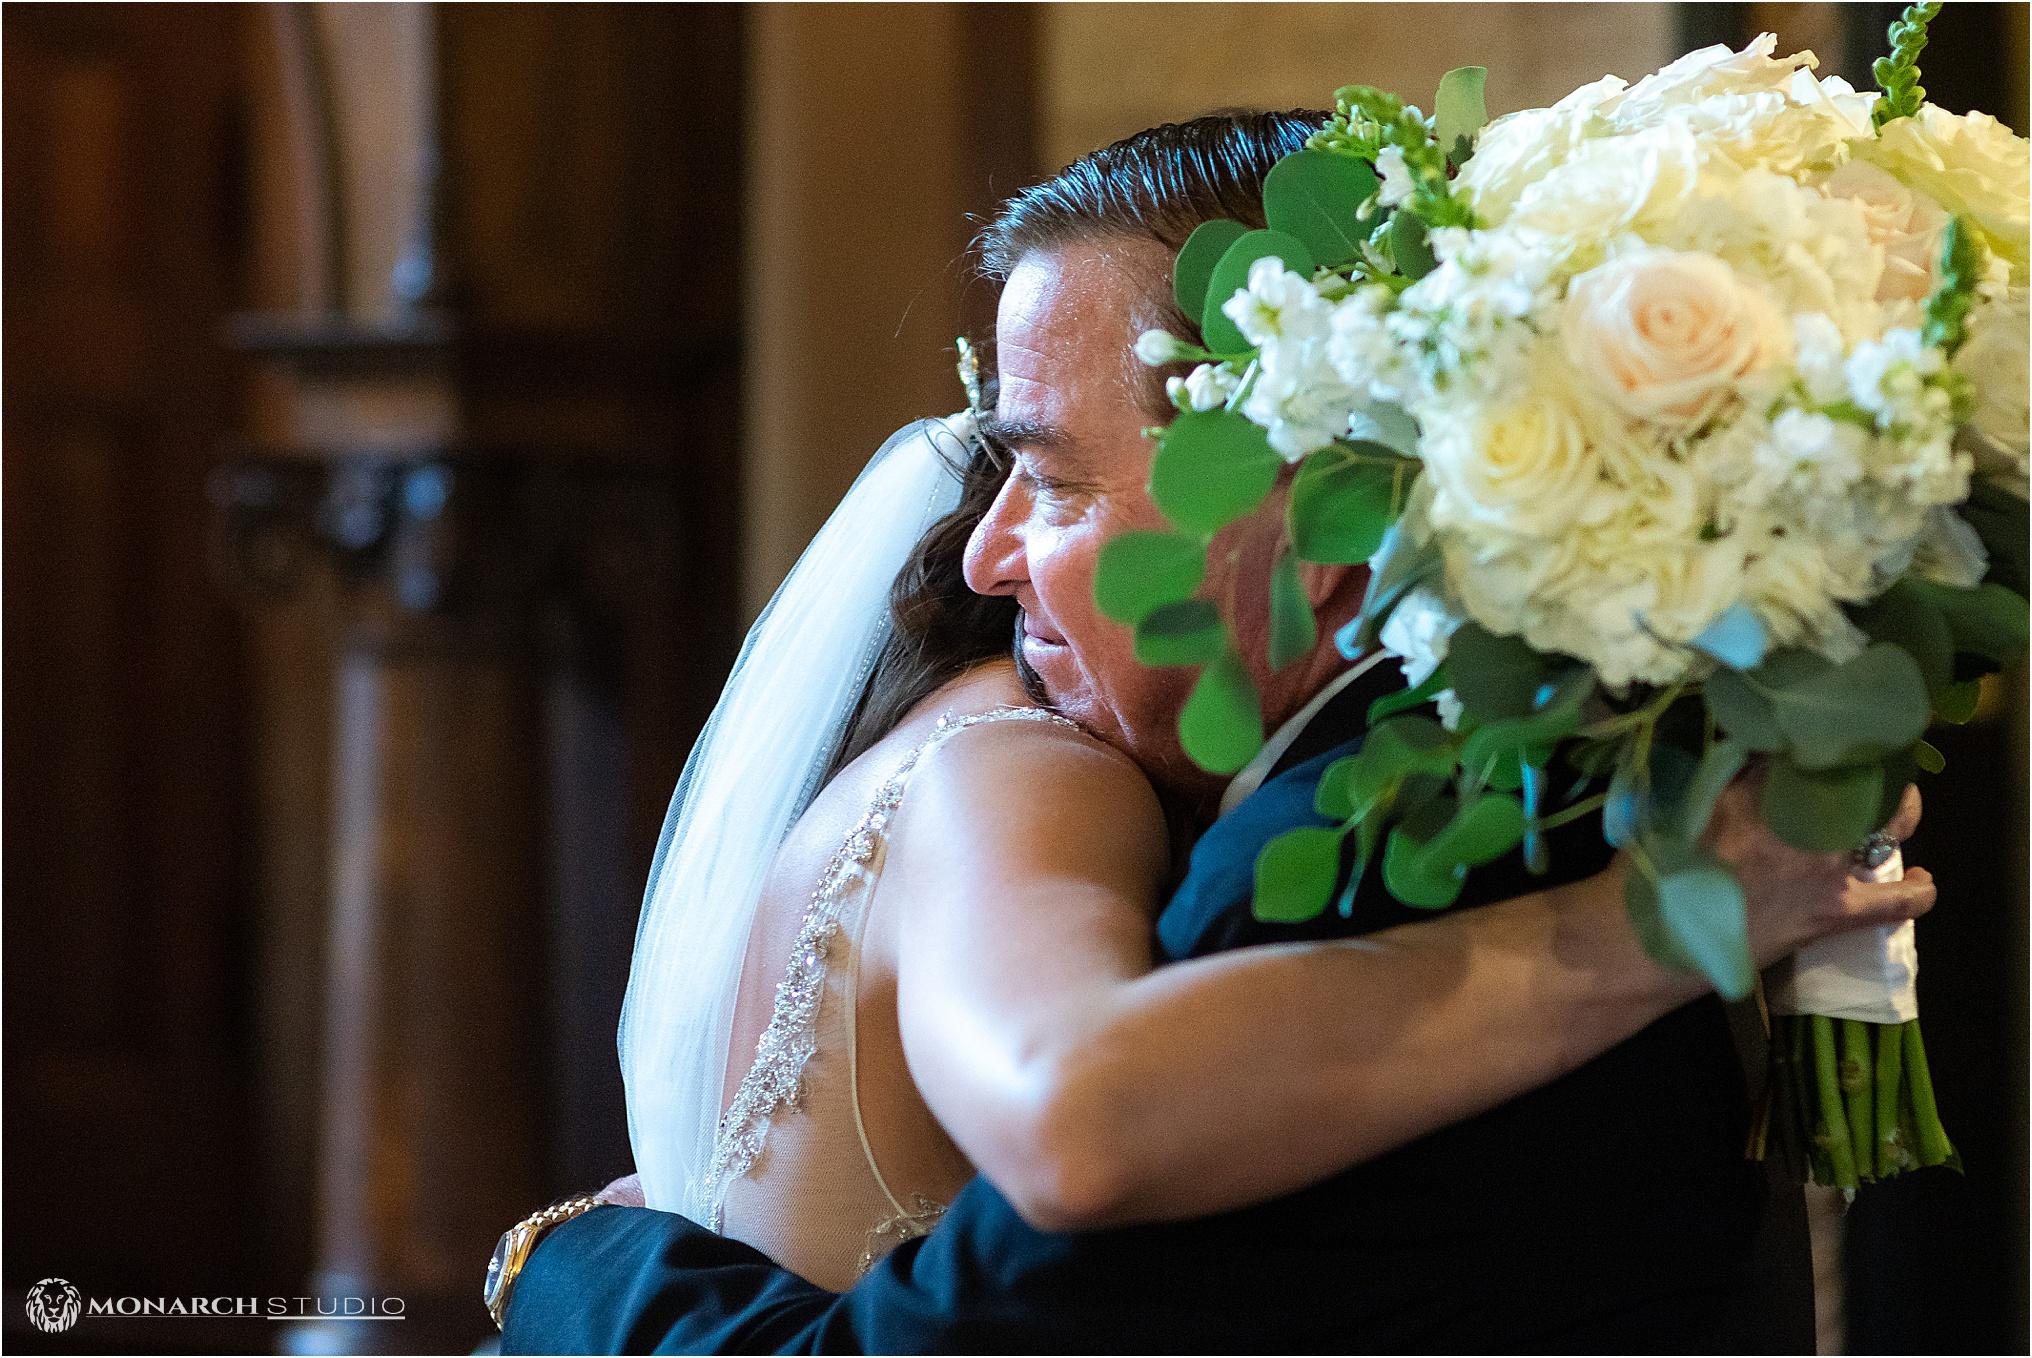 saint-augustine-wedding-photographer-treasury-012.jpg